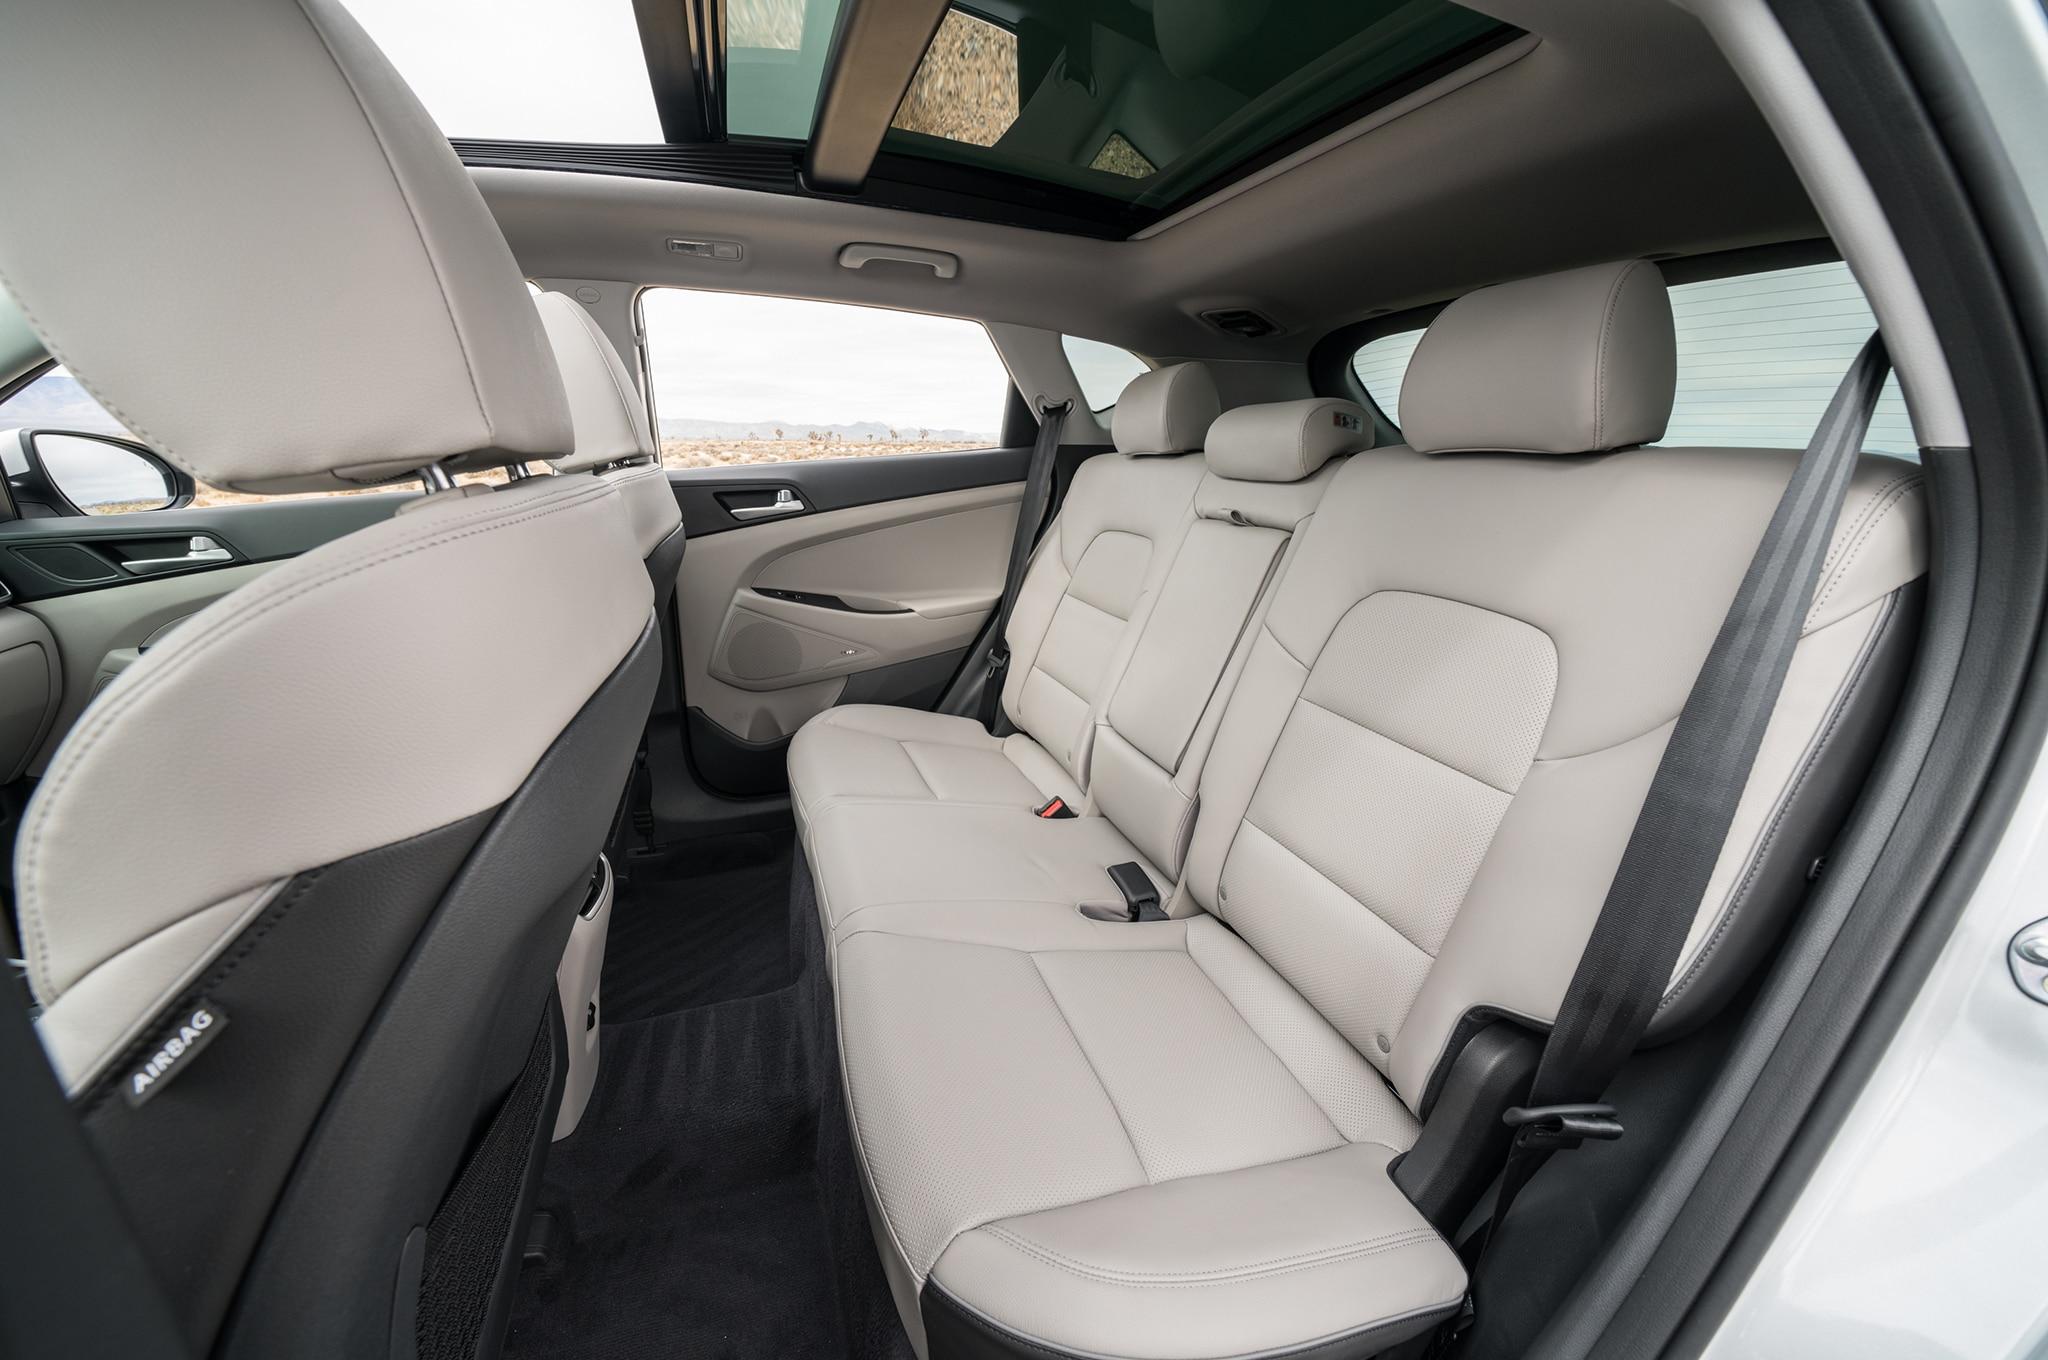 2019 Hyundai Tucson rear interior seats 03 - Motor Trend ...